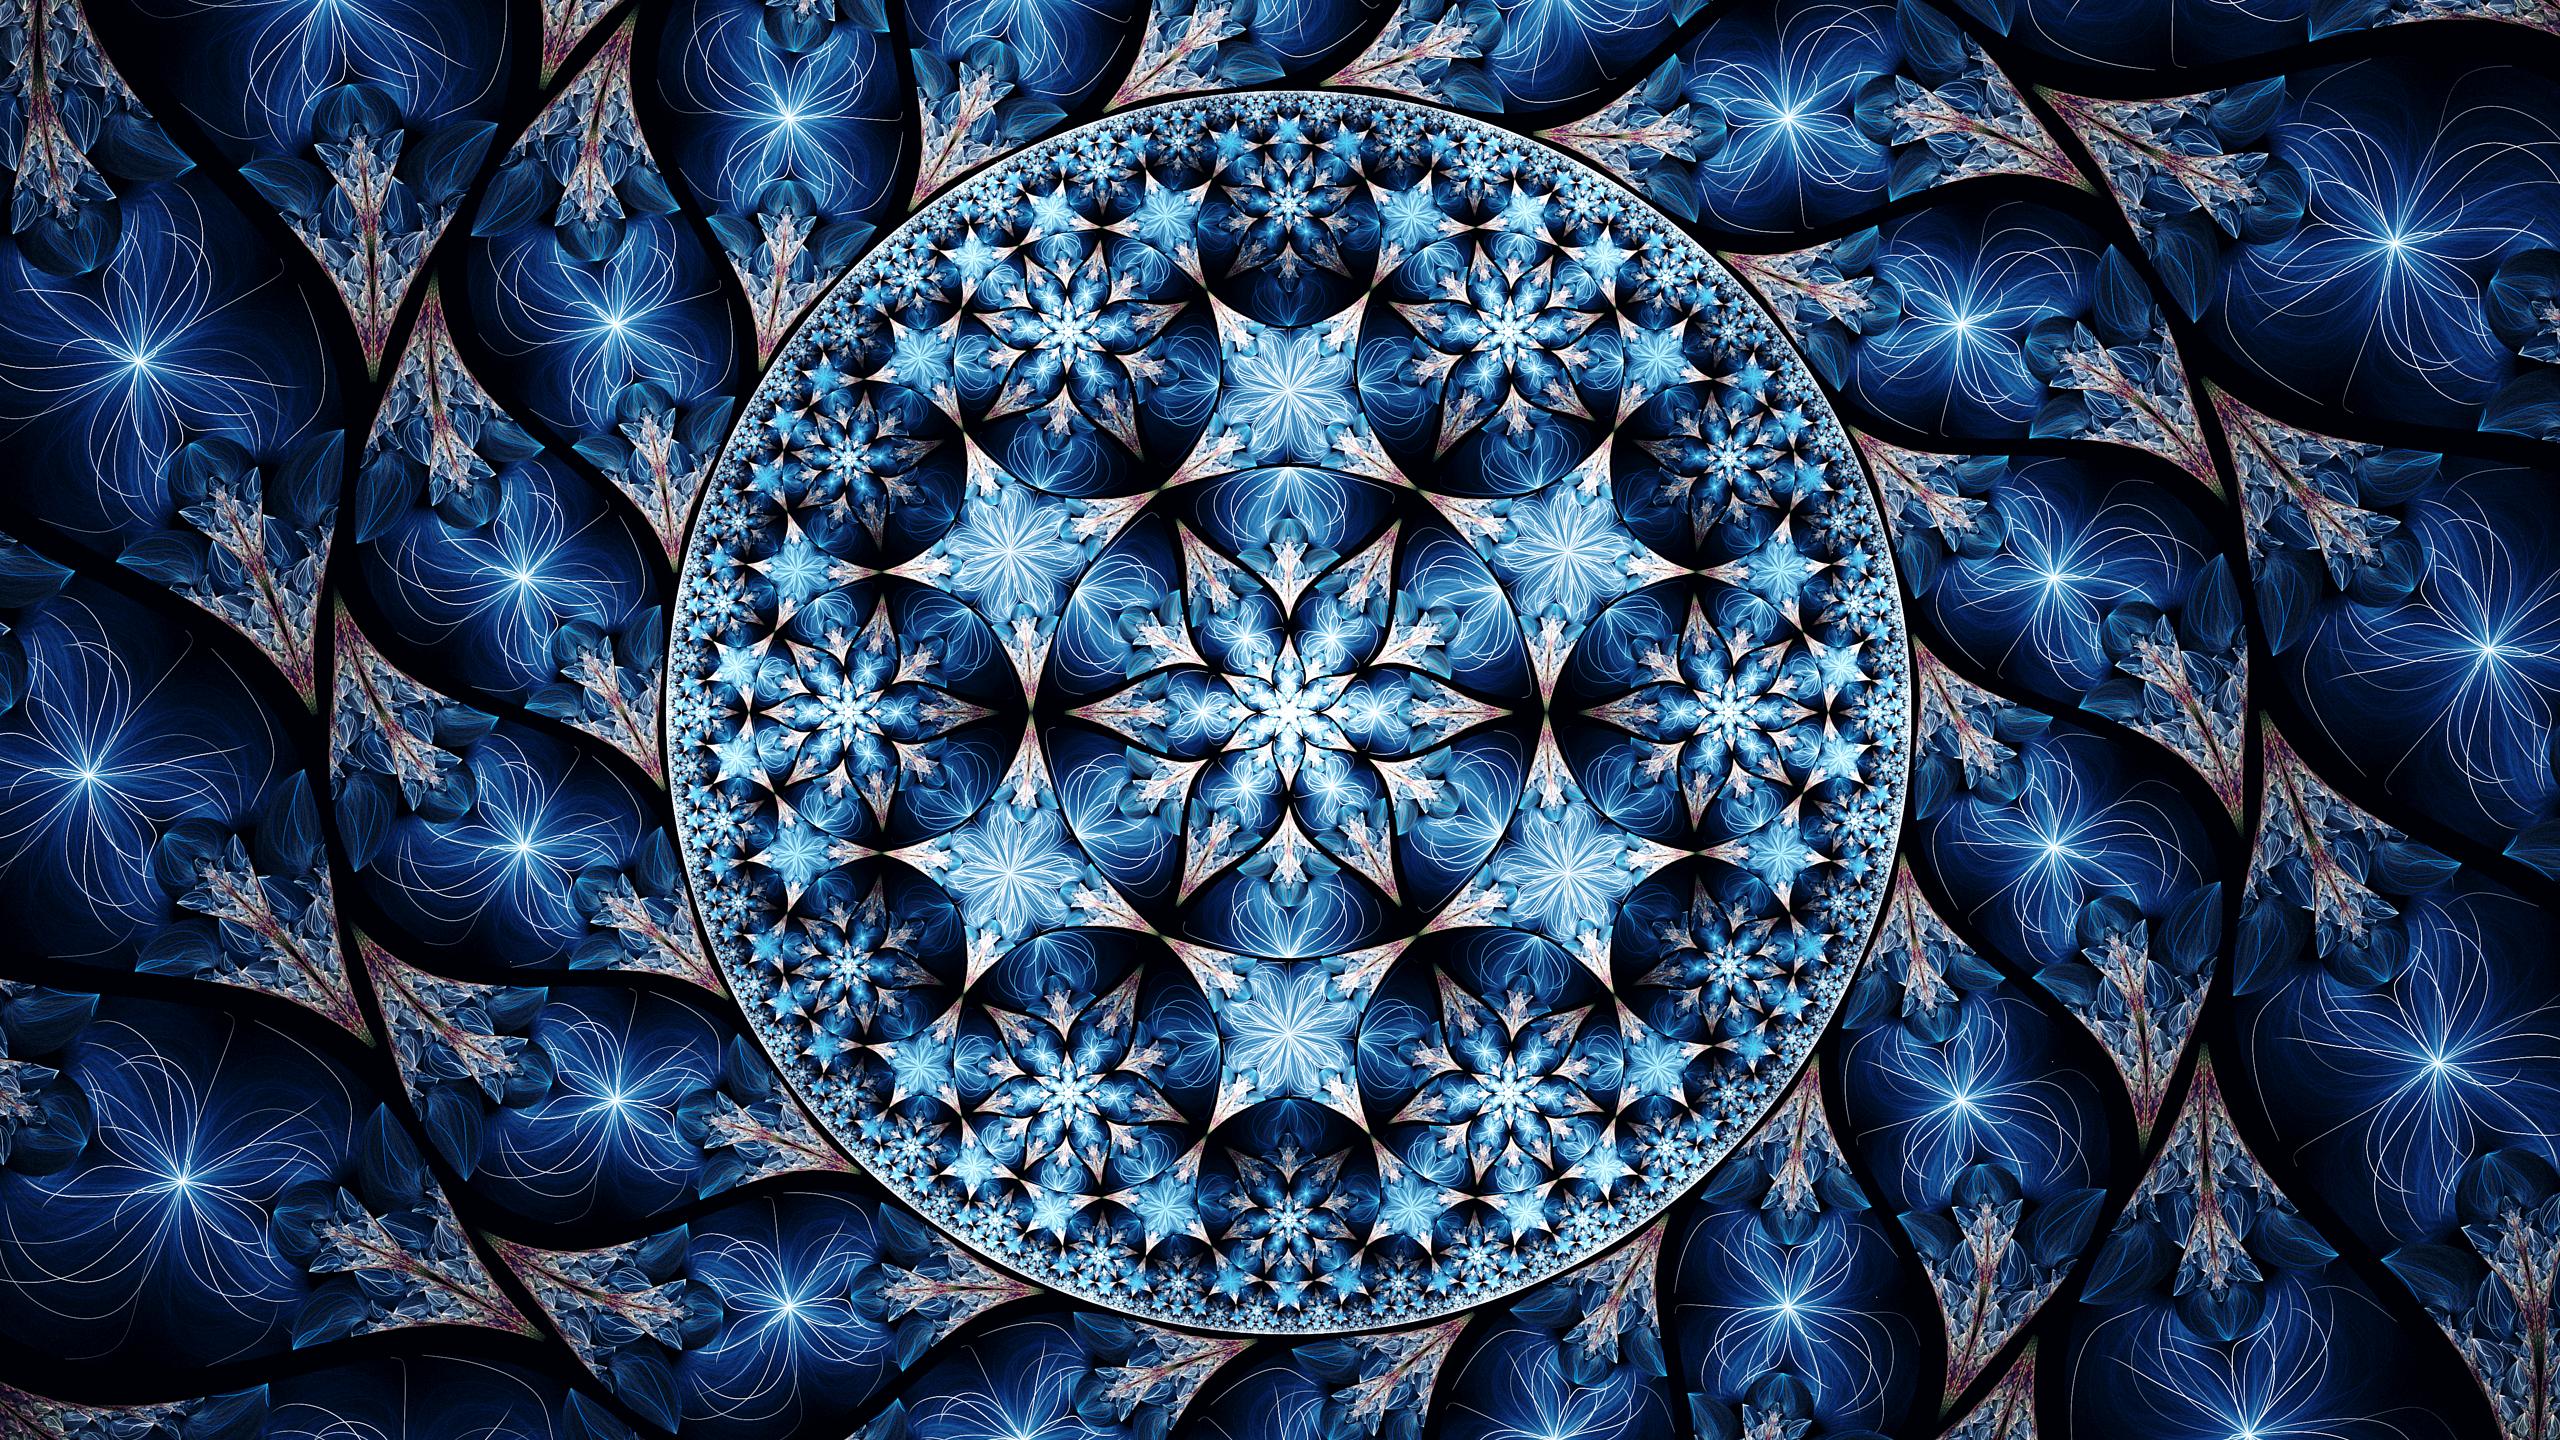 Artistic Blue Digital Art Fractal Pattern 2560x1440